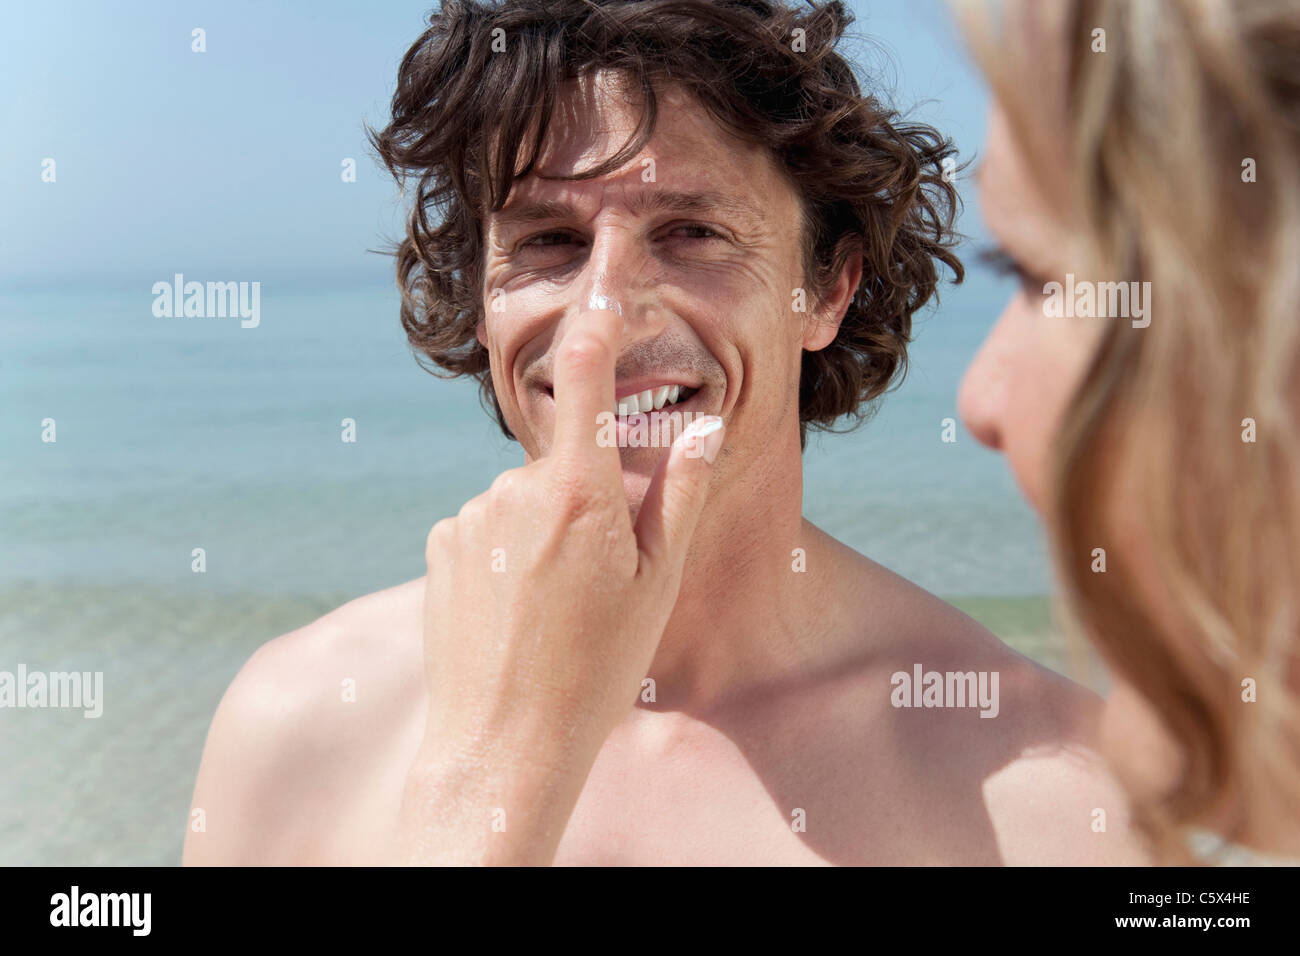 Spain, Mallorca, Woman applying suncream on man's nose - Stock Image